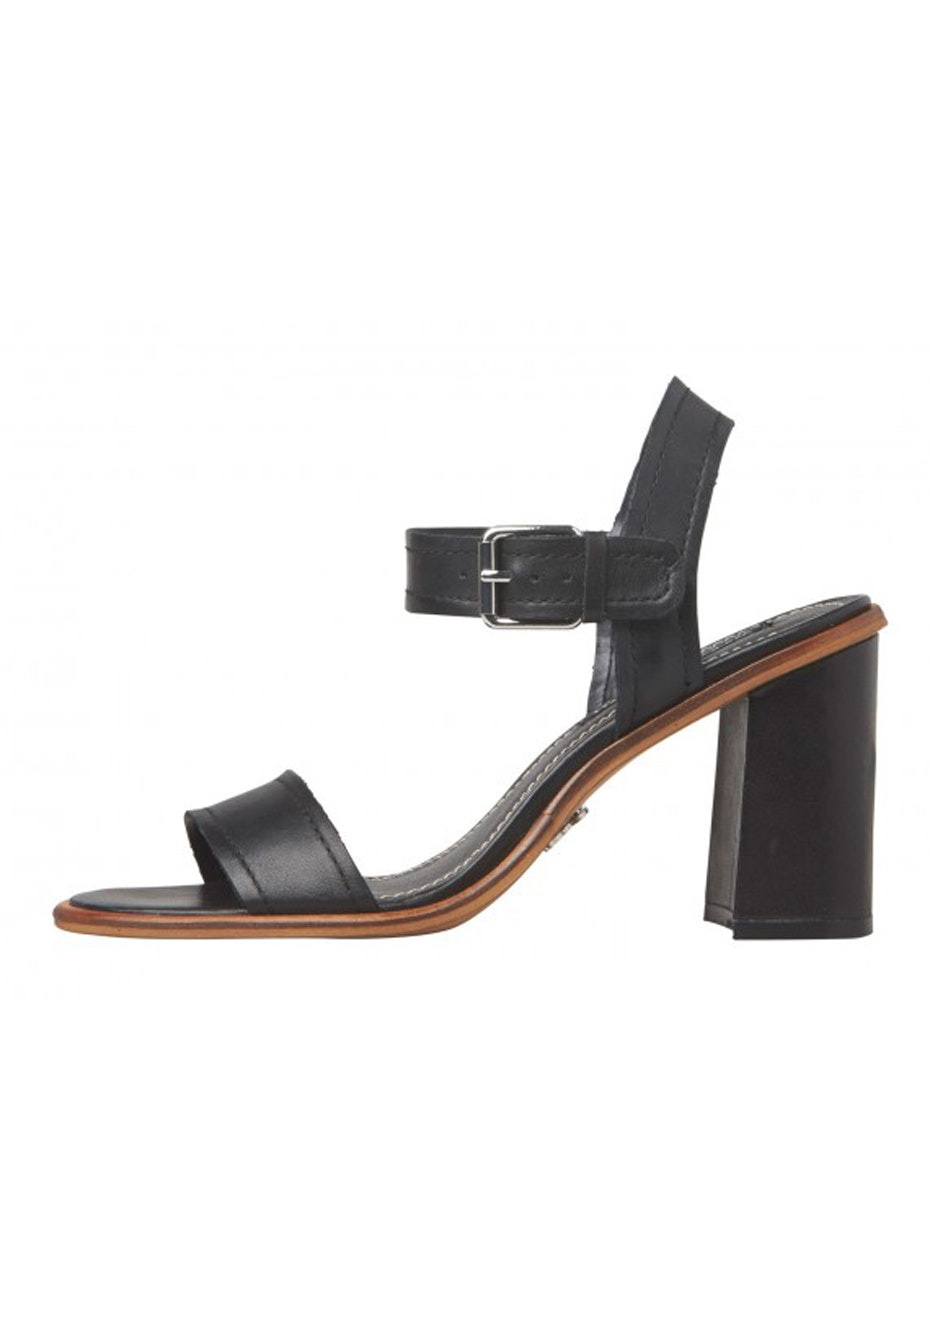 Windsor Smith - Tash - Black Leather